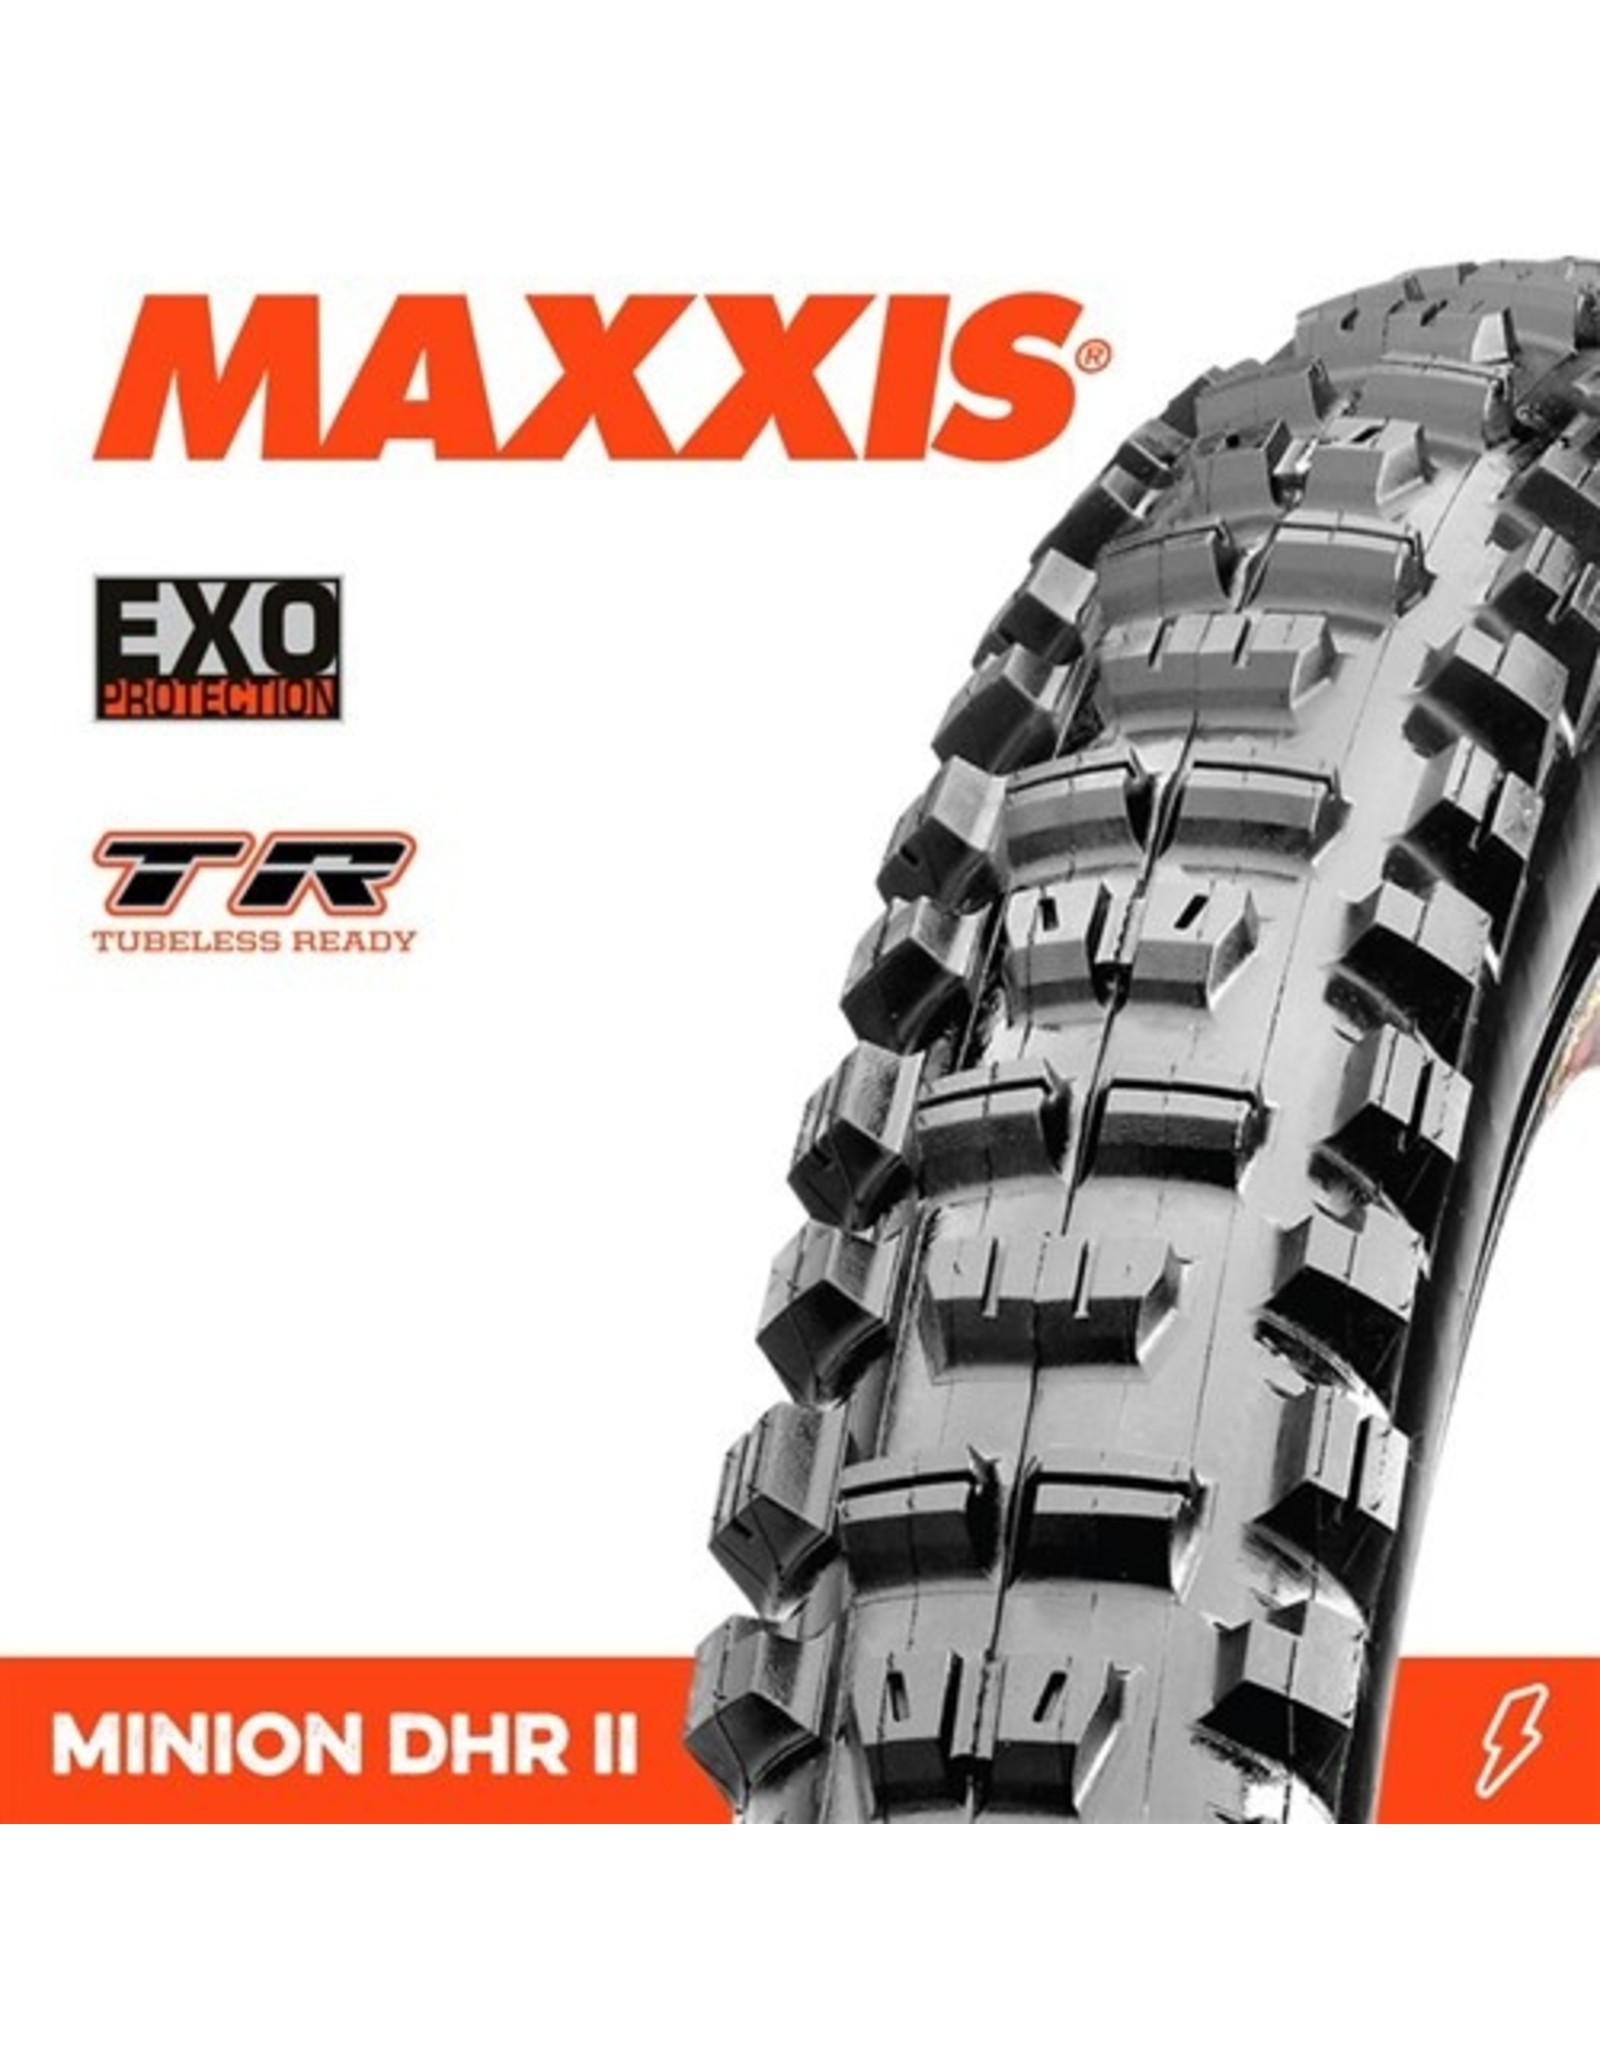 Maxxis MAXXIS MINION DHR II EXO